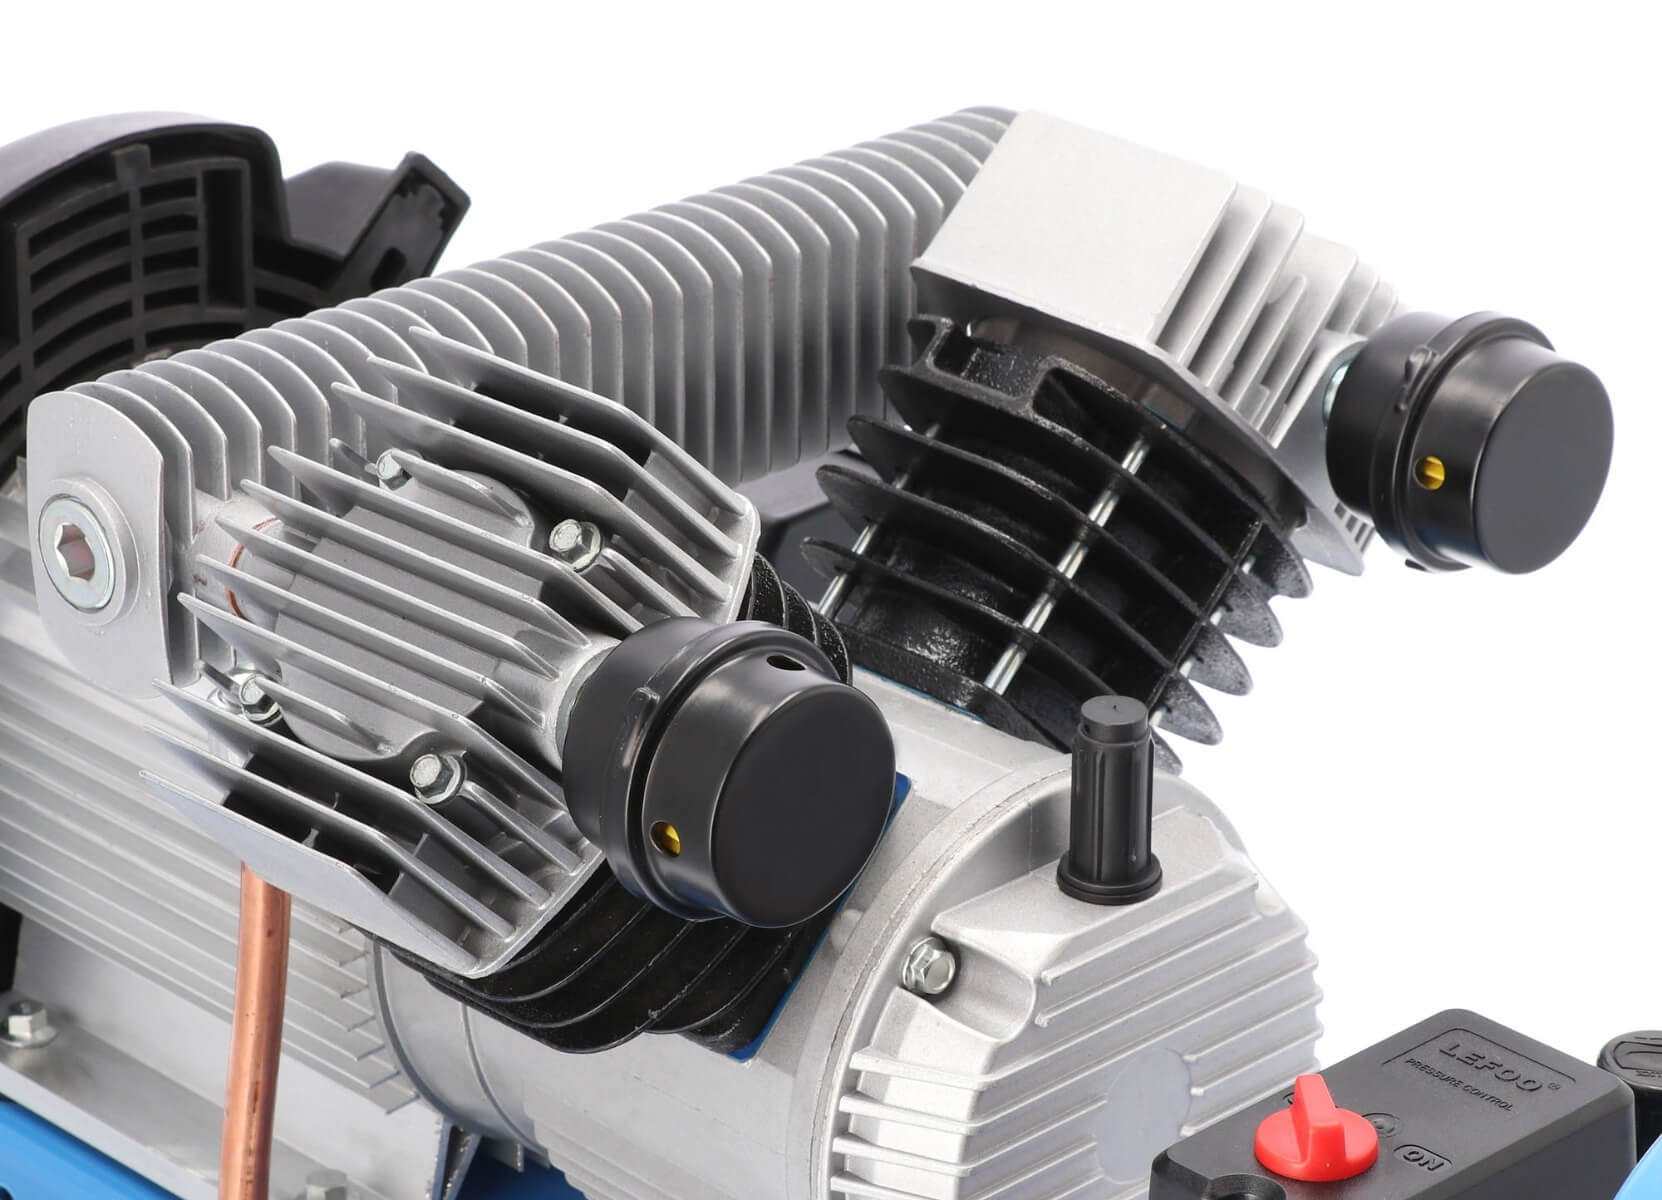 Compressor motor LM 50-350